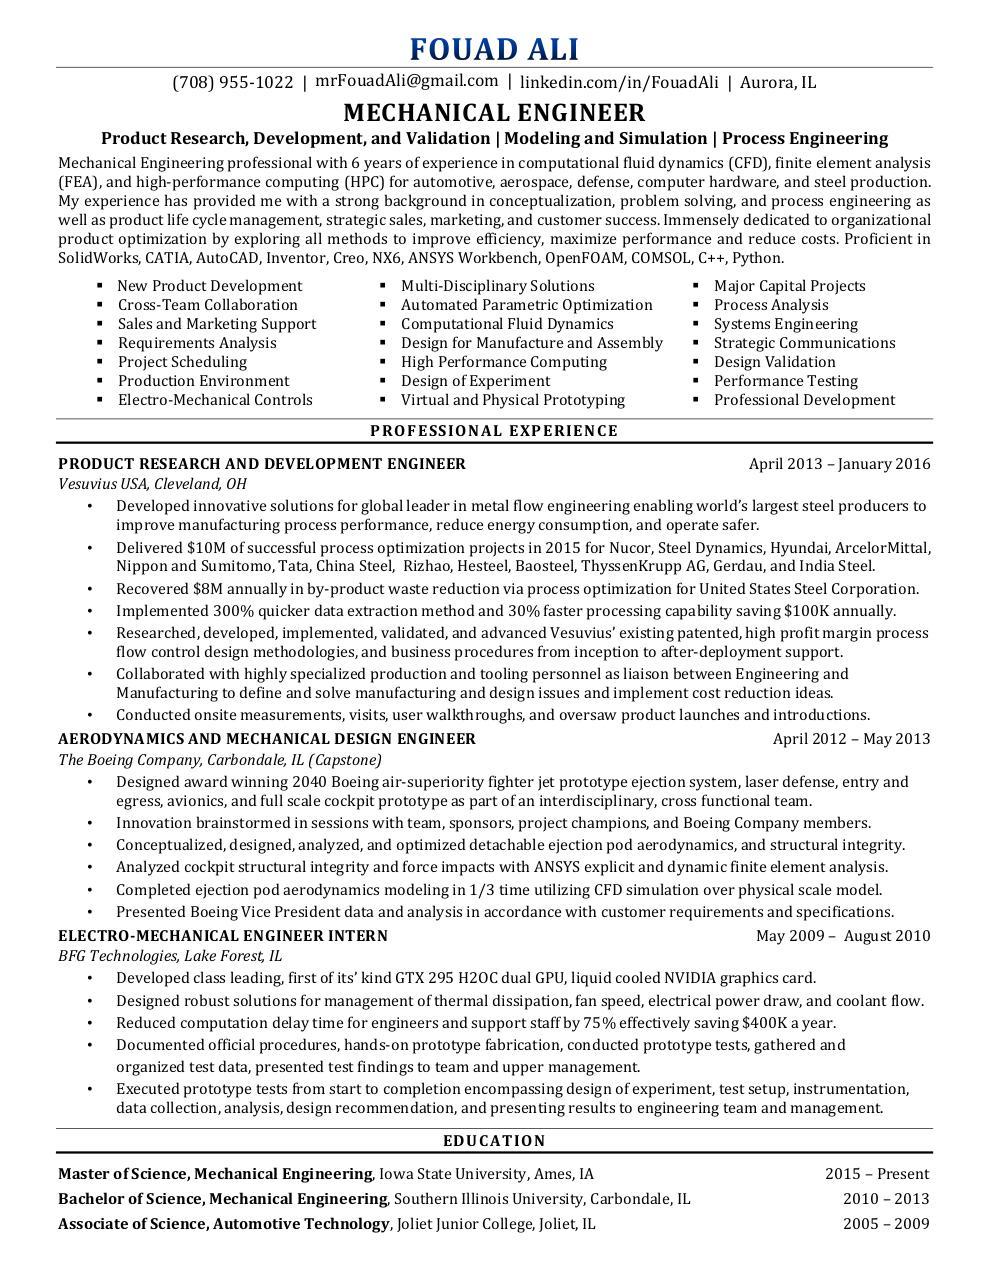 fouad ali u0026 39 s standard resume - fouad ali